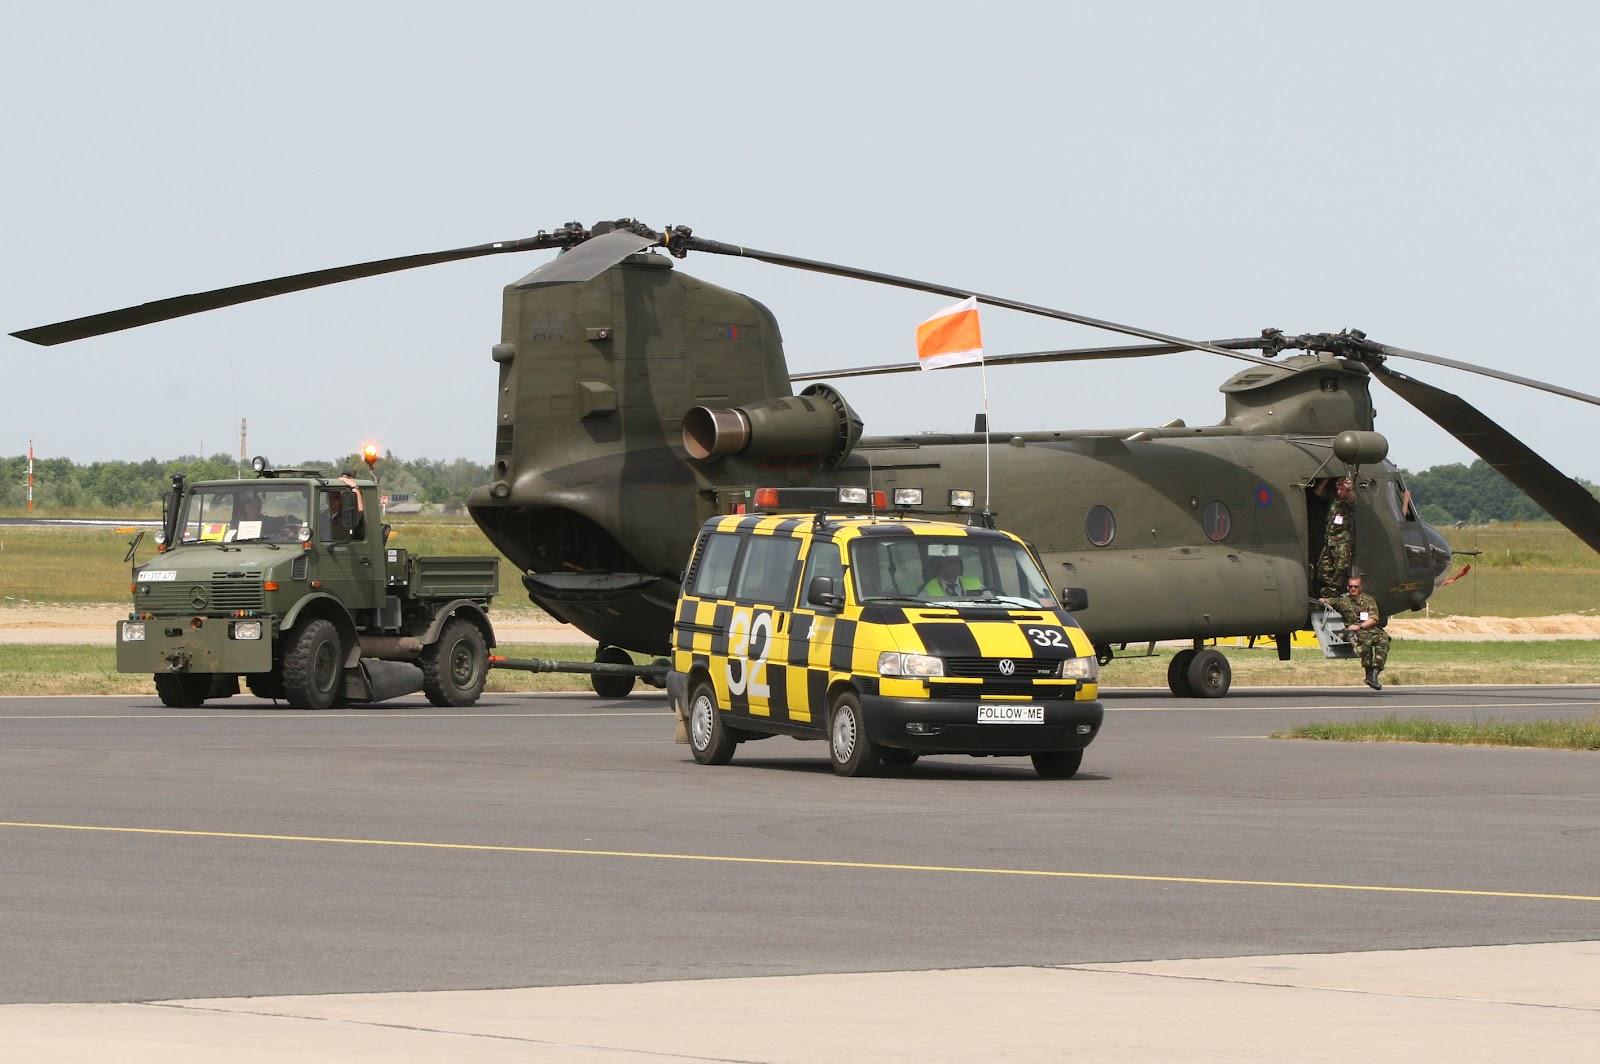 http://1.bp.blogspot.com/-qSDL-Ou2UlY/T_WkTVYy1aI/AAAAAAAAKiY/BKz_Gxlo9w8/s1600/boeing_ch47_chinook_royal_air_force.jpg